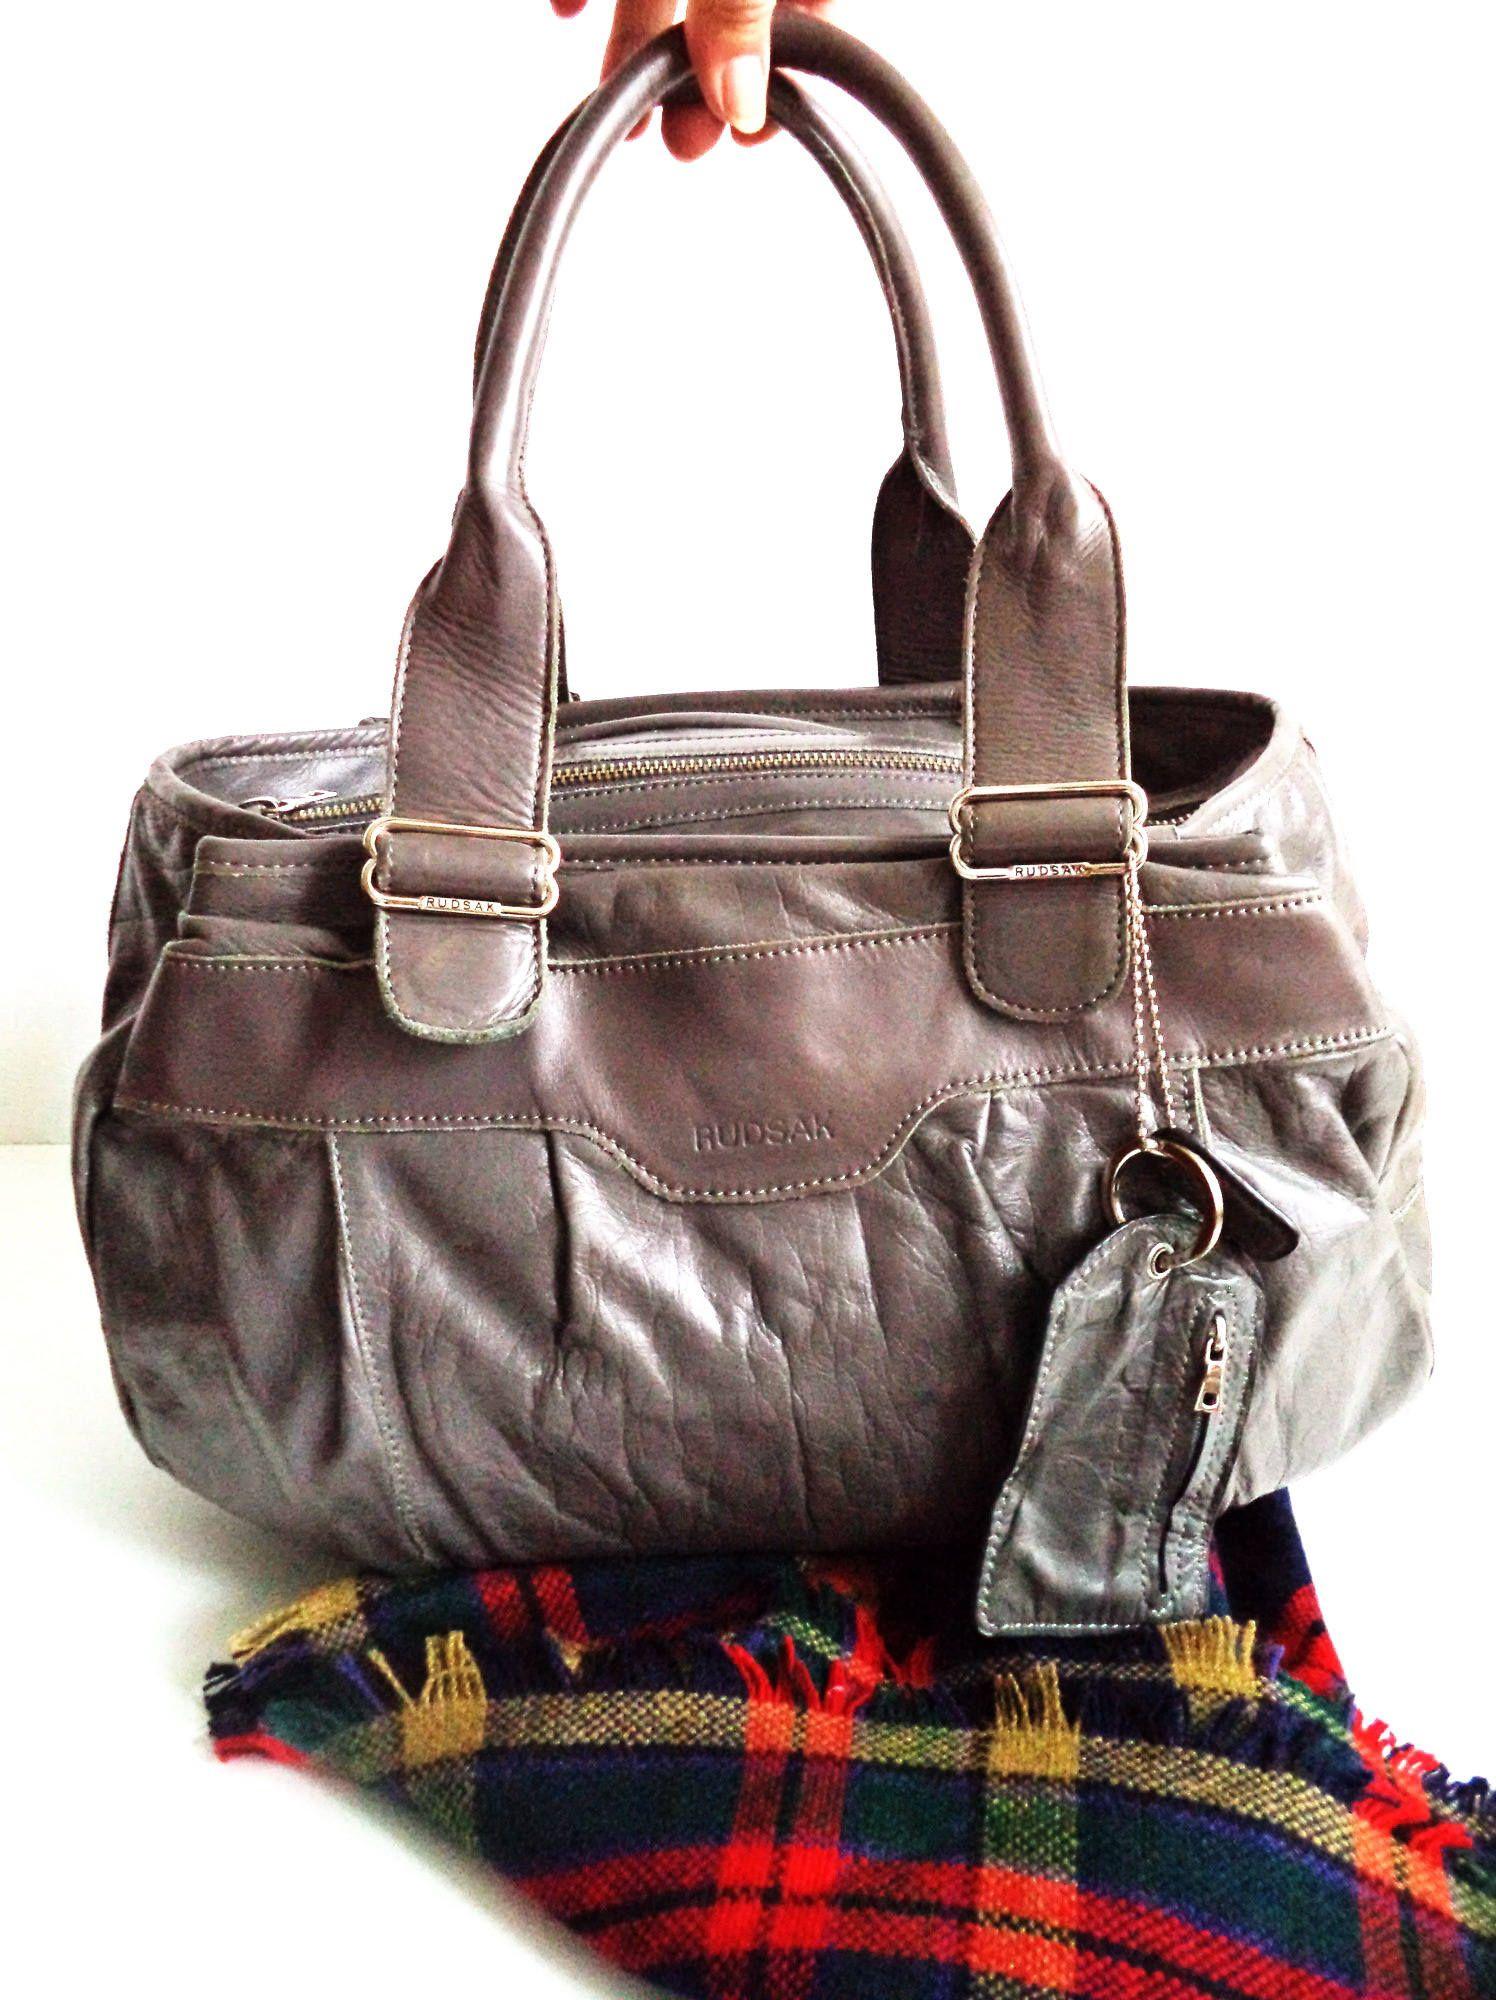 RUDSAK huge Duffel Leather Speedy Barrel Bag Satchel Purse Grey Gunmetal  Tote b2561ee895766